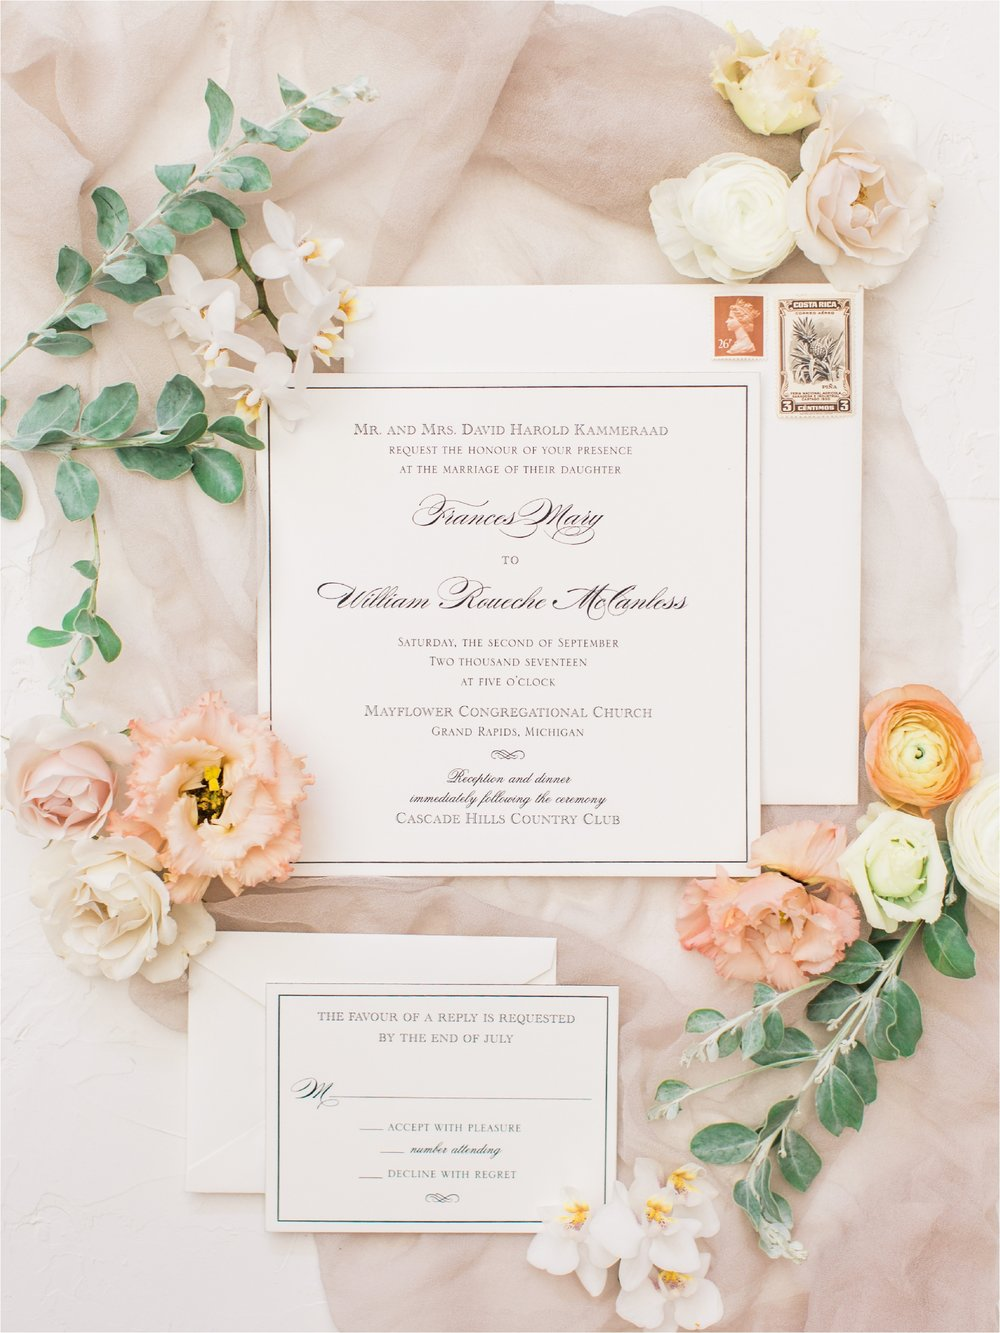 WILLIAM AND FRANCIE // A GRAND RAPIDS WEDDING — Samantha James ...